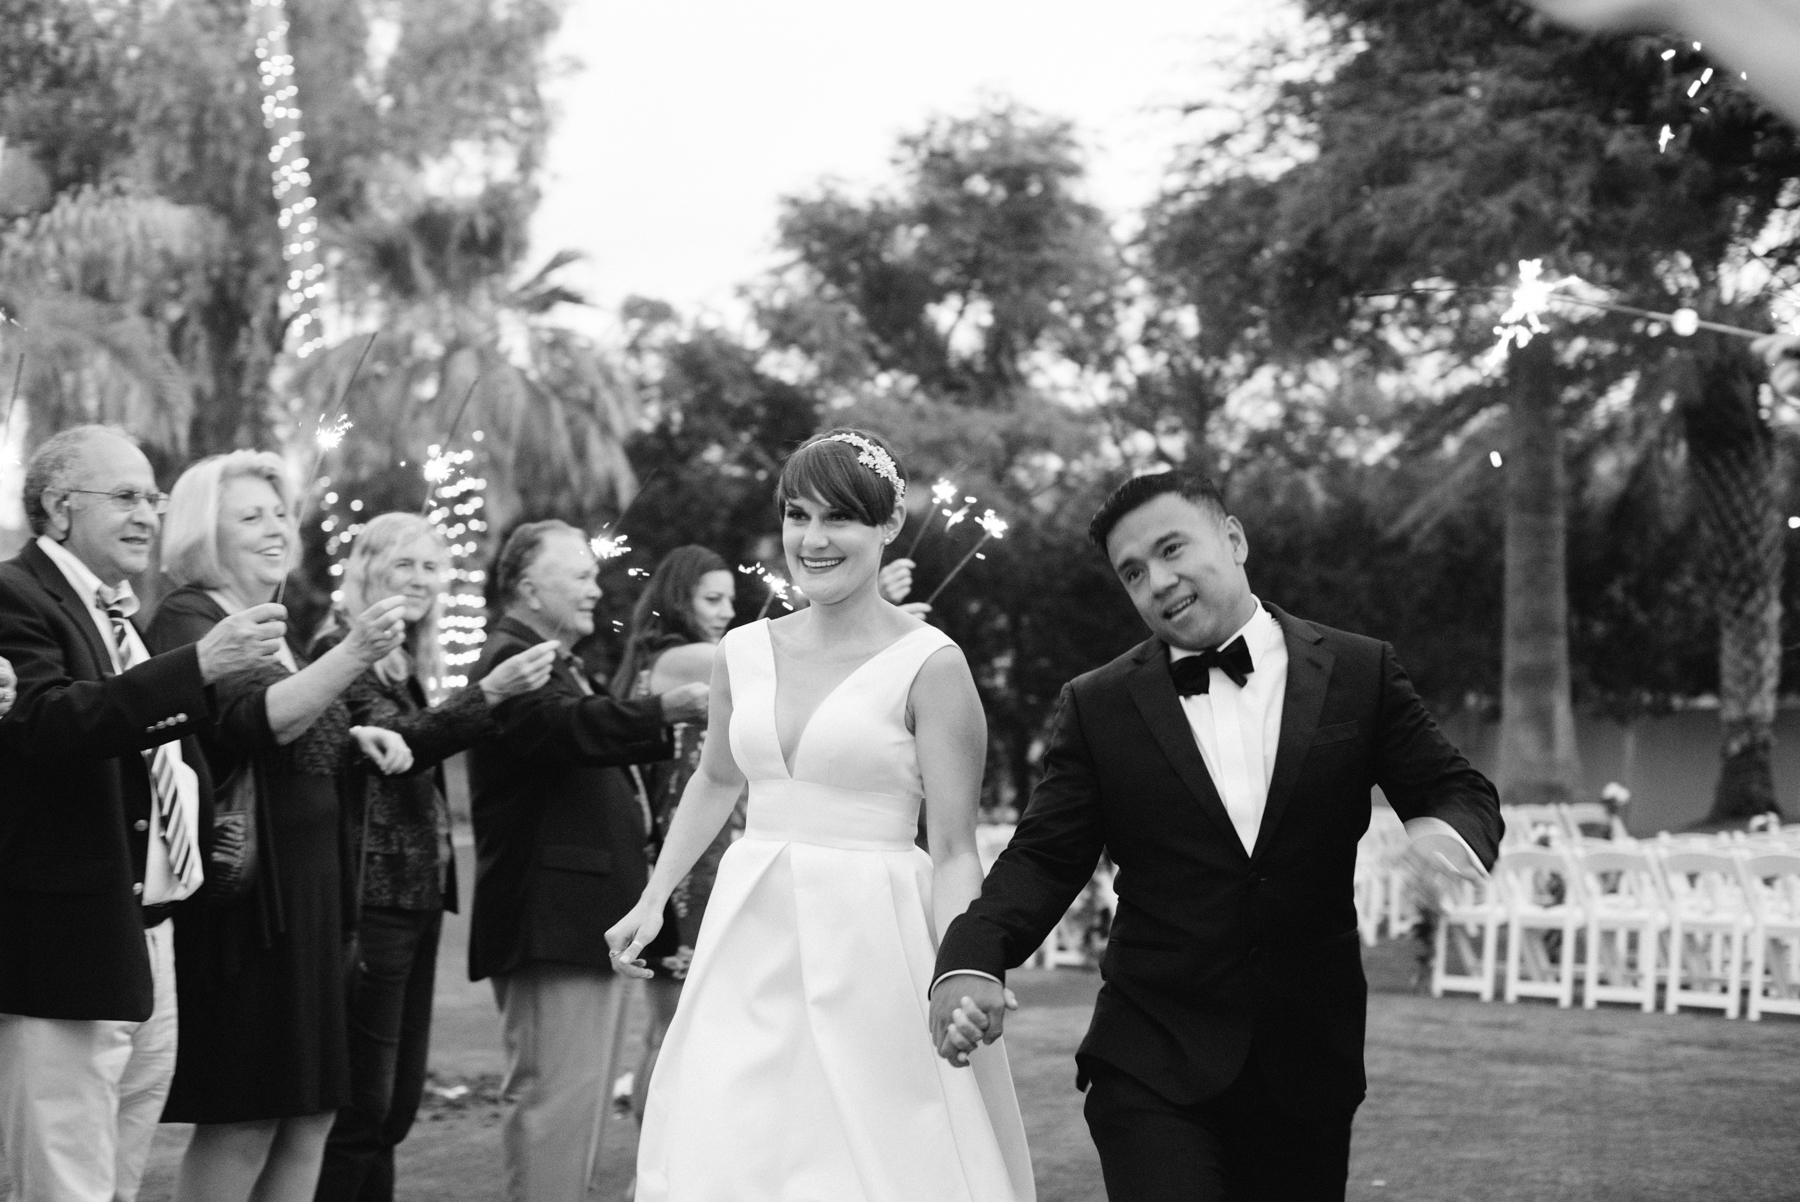 Secret Garden Event Center Wedding - Meredith Amadee Photography-1-10.jpg